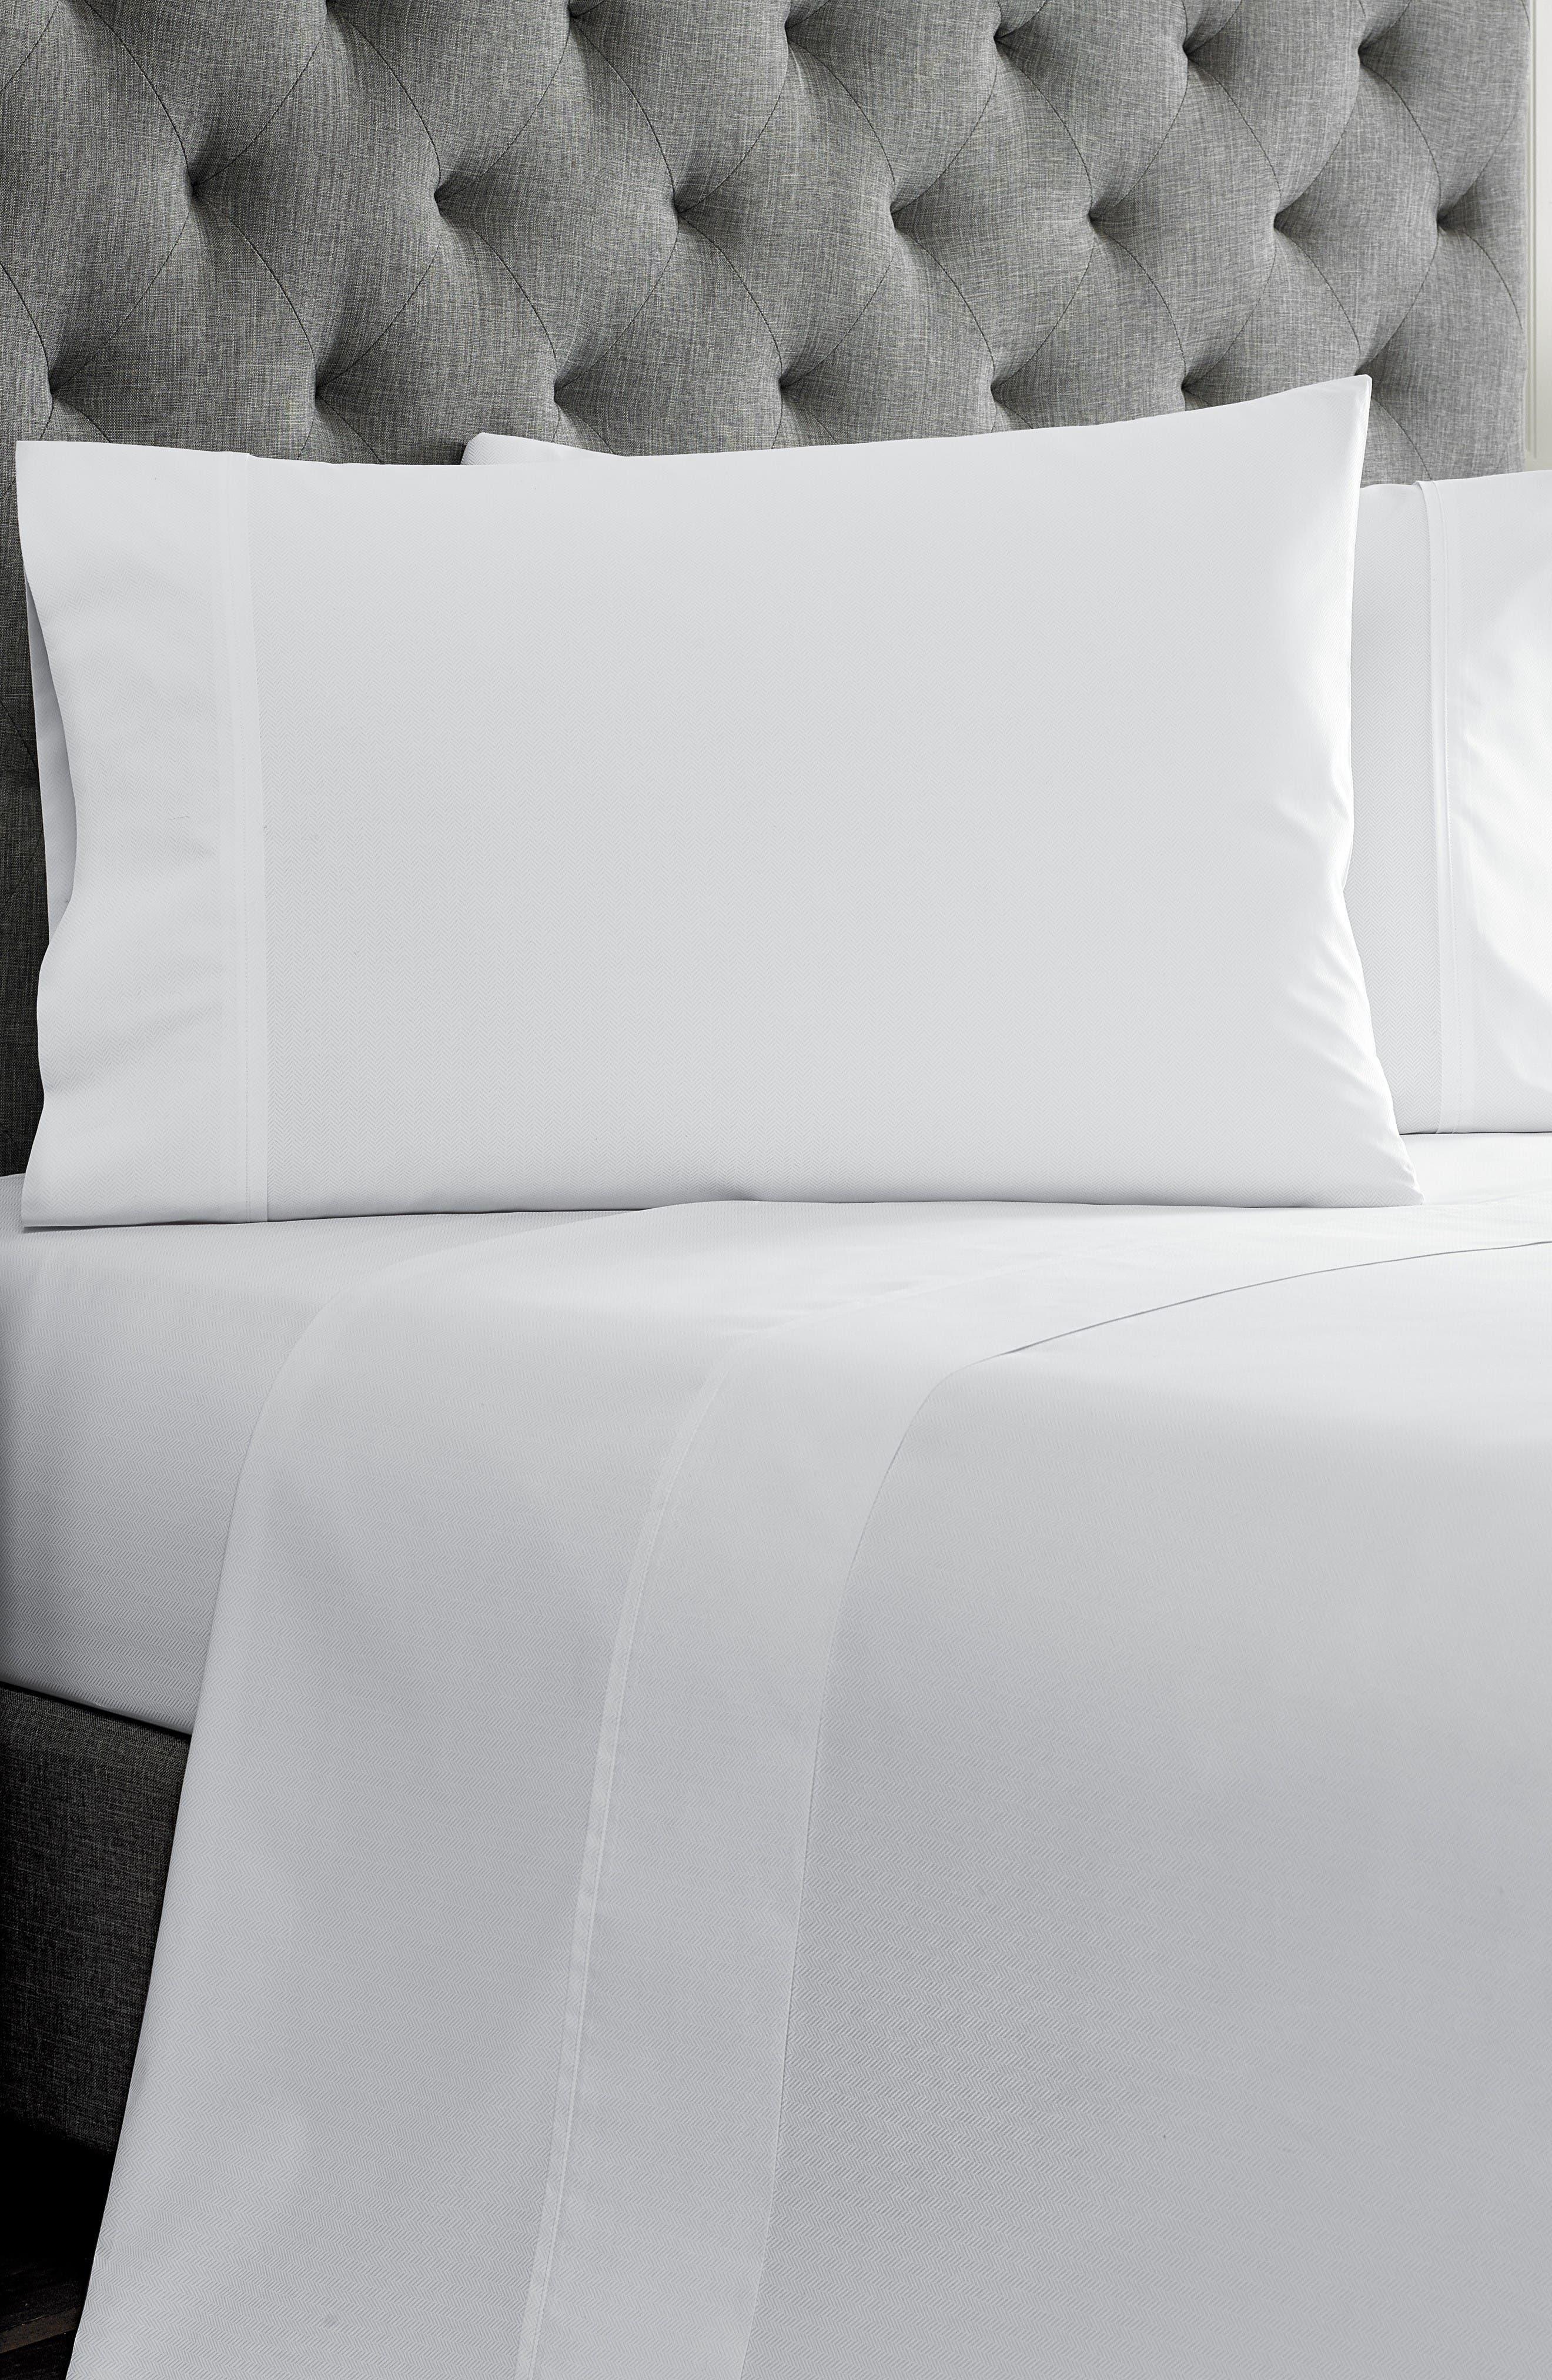 Alternate Image 1 Selected - Tommy Hilfiger Robinson Herringbone Pillowcases